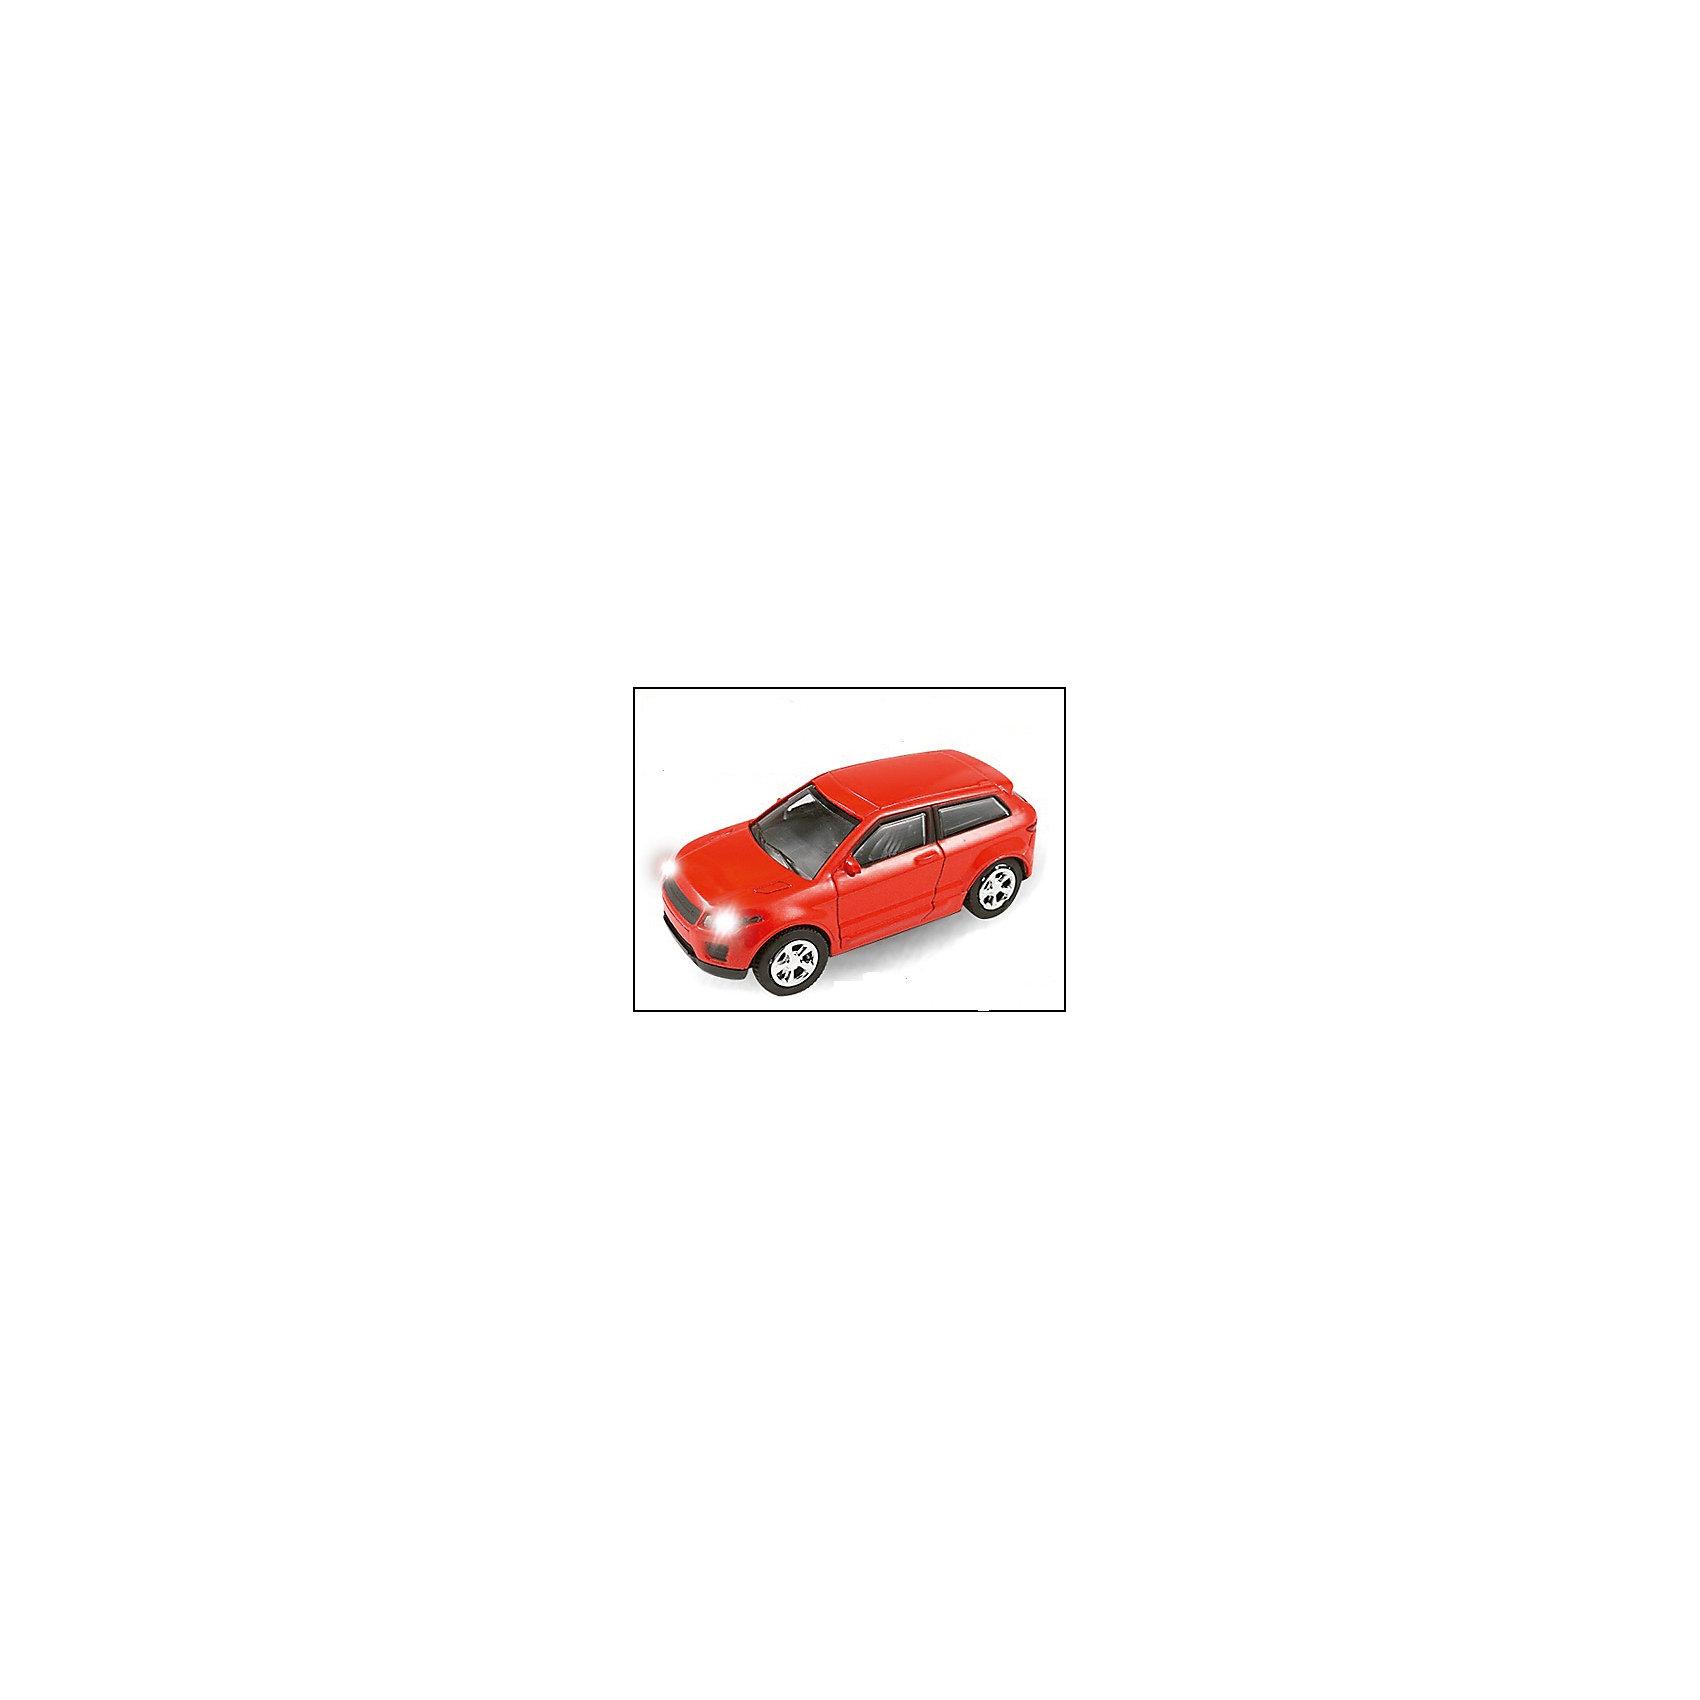 Машинка England Luxury Crossover со светом фар 1:43, AutotimeМашинки<br><br><br>Ширина мм: 165<br>Глубина мм: 57<br>Высота мм: 75<br>Вес г: 13<br>Возраст от месяцев: 36<br>Возраст до месяцев: 2147483647<br>Пол: Мужской<br>Возраст: Детский<br>SKU: 5584031